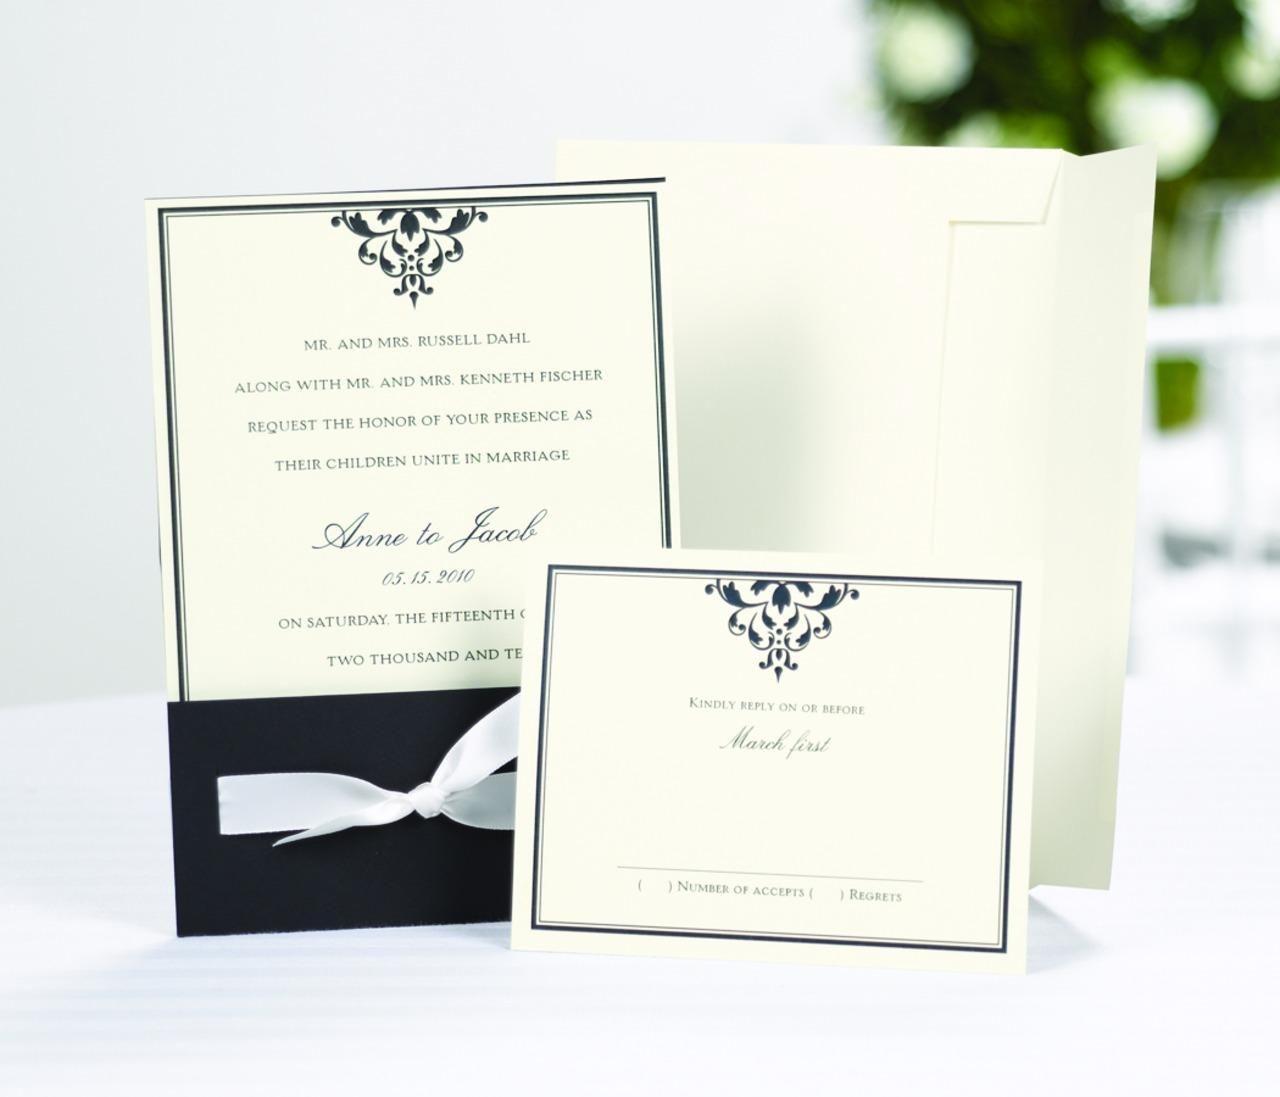 Bottom Ribbon-Tied Wrap Wedding Invitation Kit includes 25 of each ...